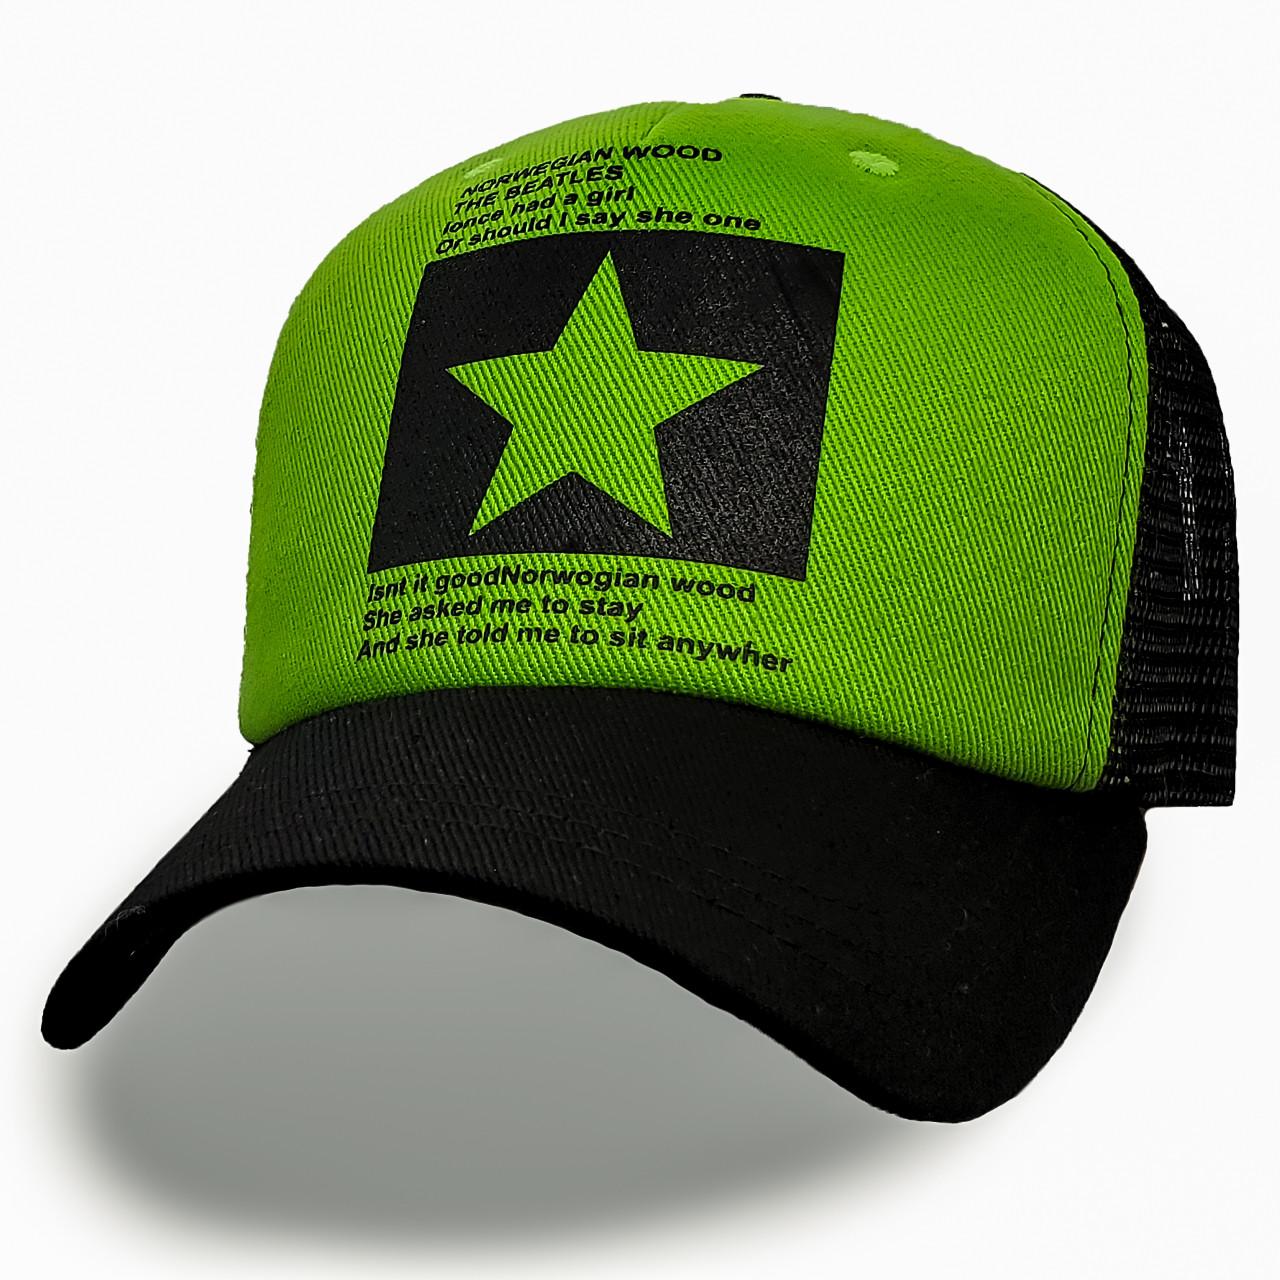 Модная летняя кепка Street Star ✫ The Beatles (зелено-черная) Тракер звезда